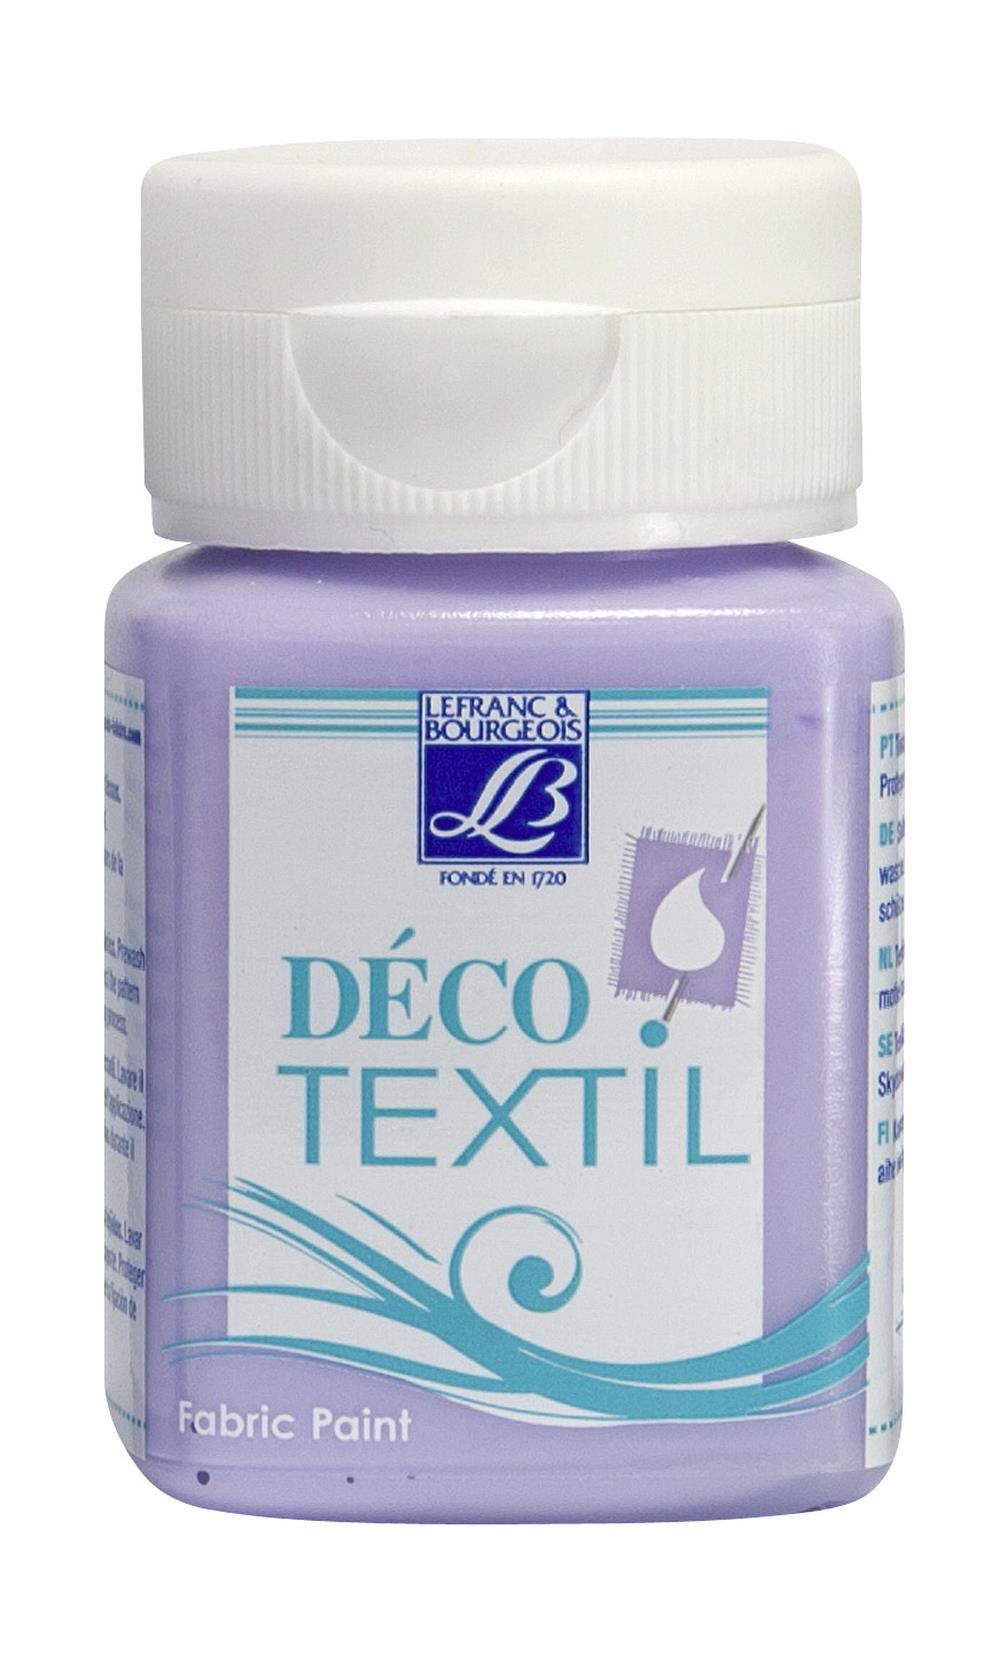 Tygfärg L&B Deco Textil 50ml  Violet -  soft 602 (4F) Utgår